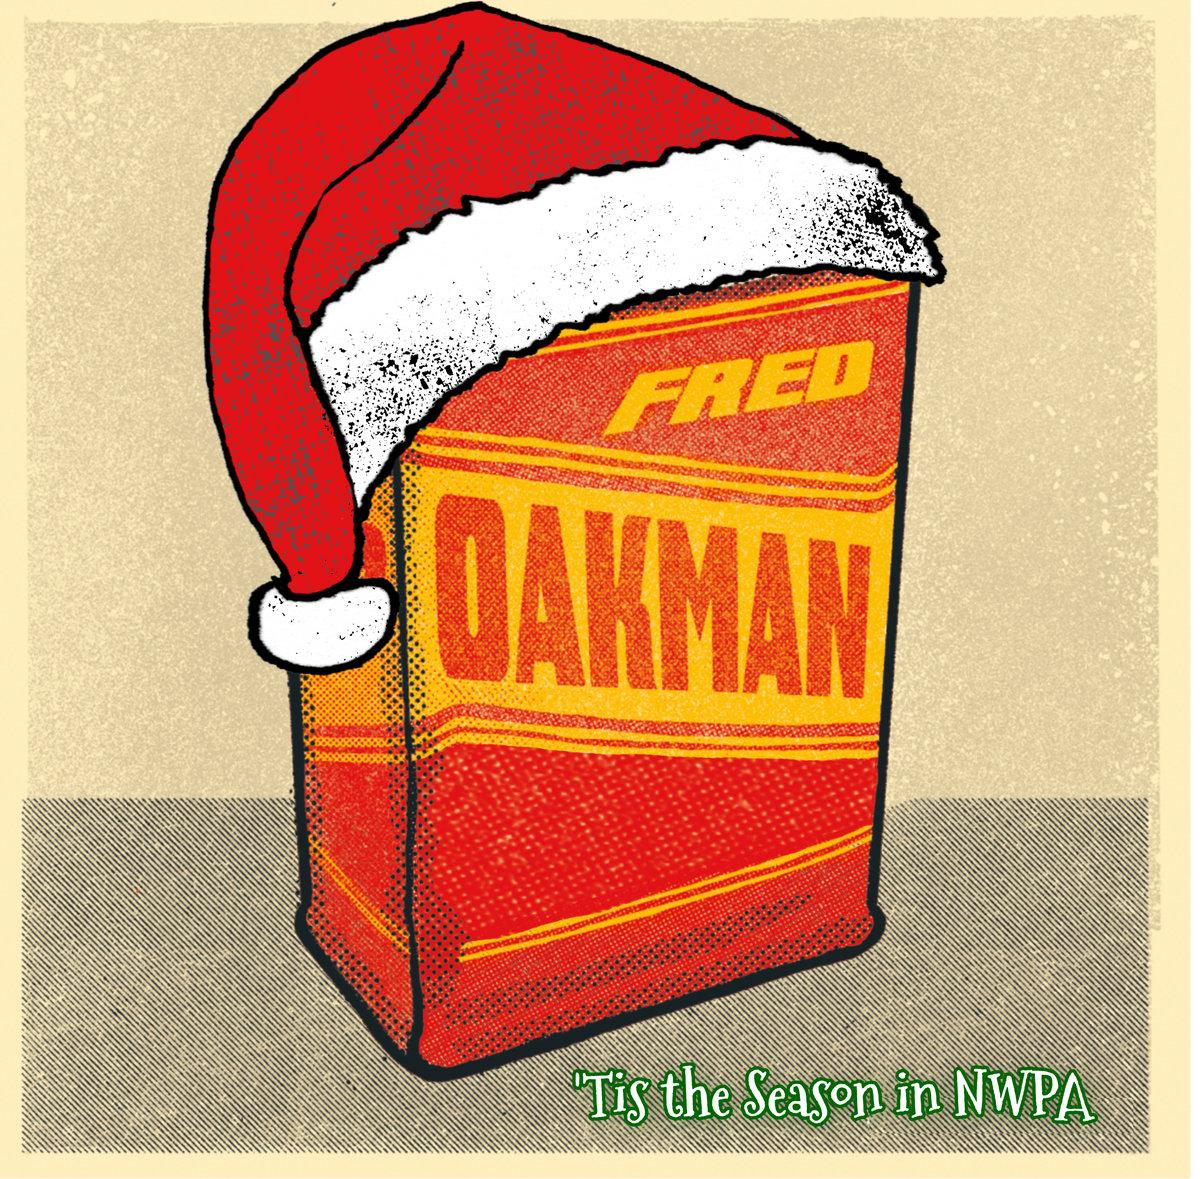 'Tis the Season in NWPA by Fred Oakman